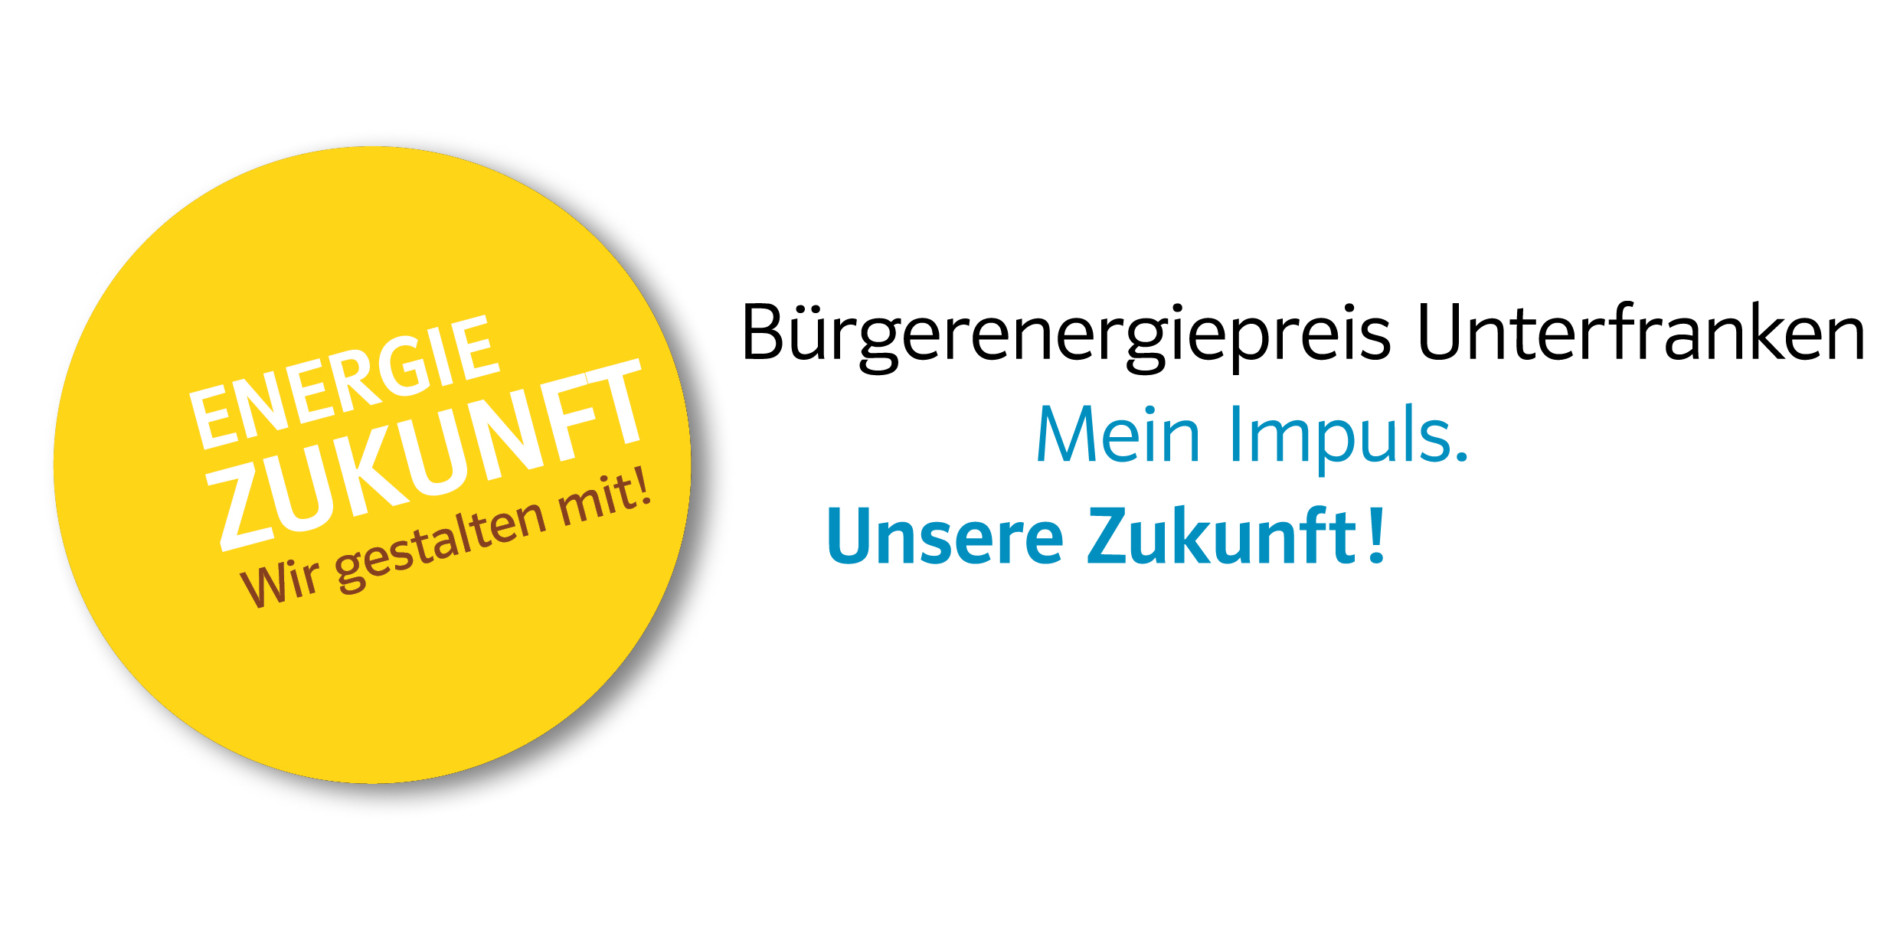 Bürgerenergiepreis Unterfranken